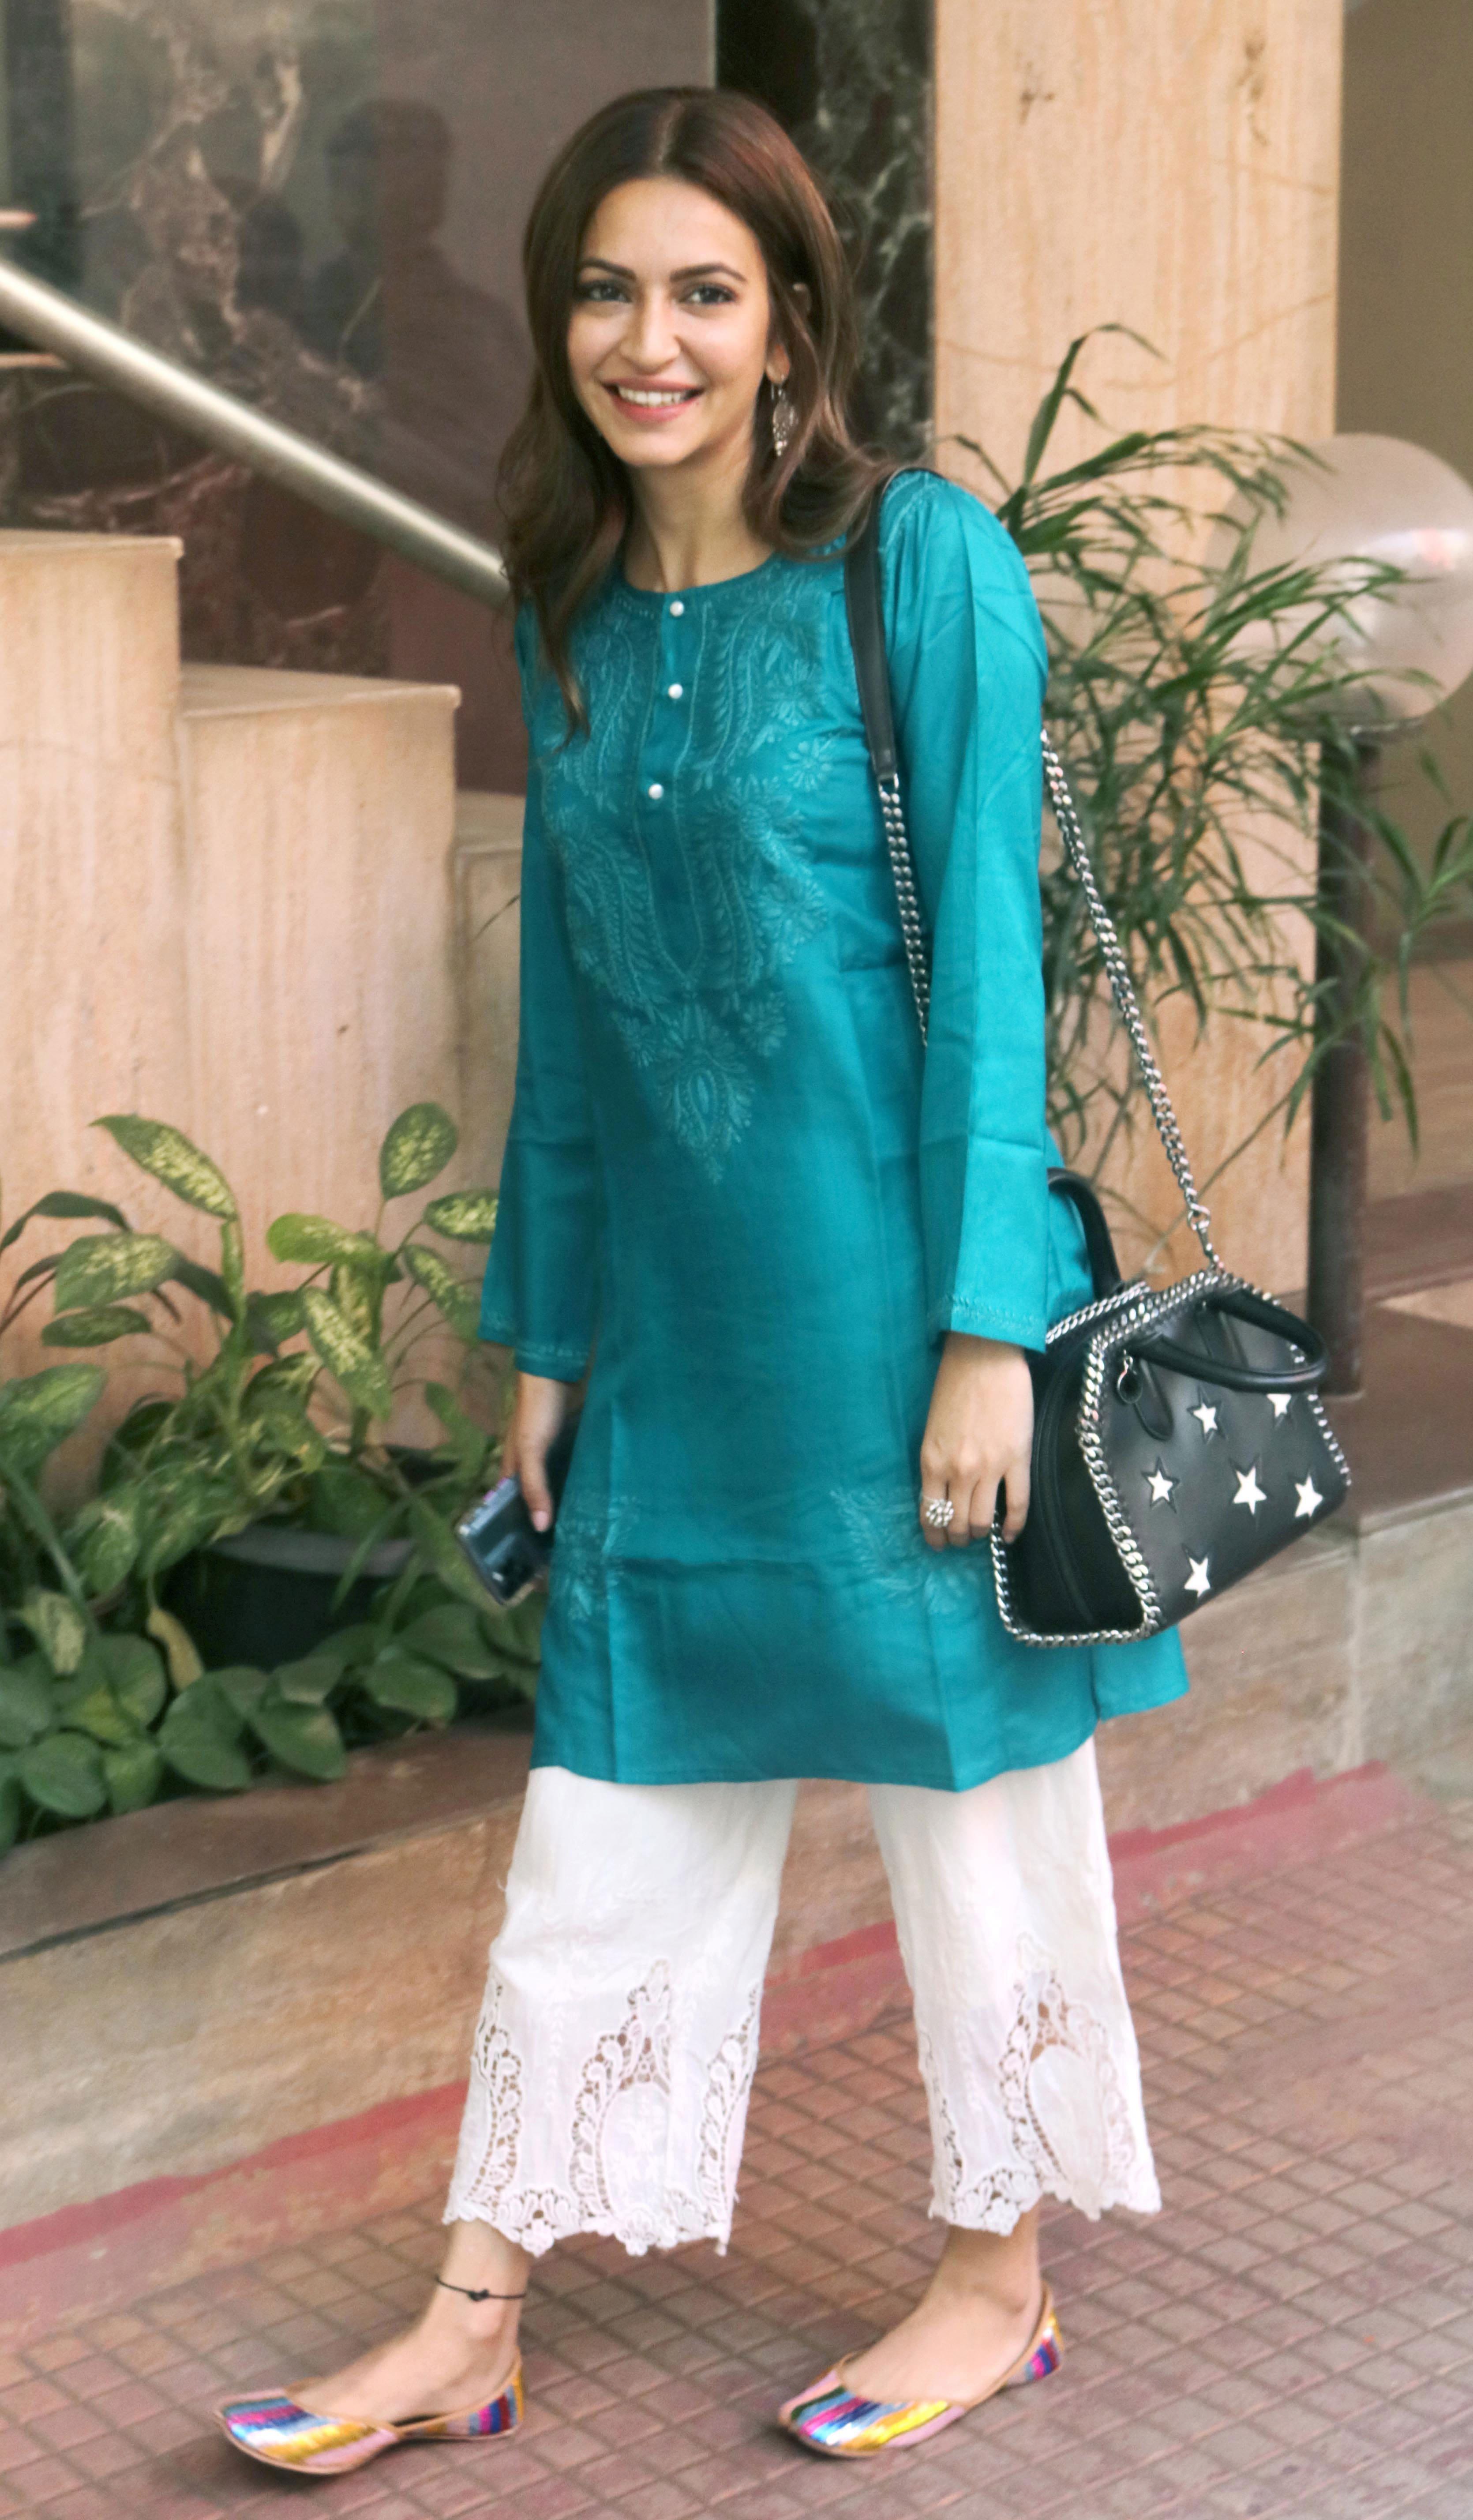 Kriti Kharbanda poses for clicks